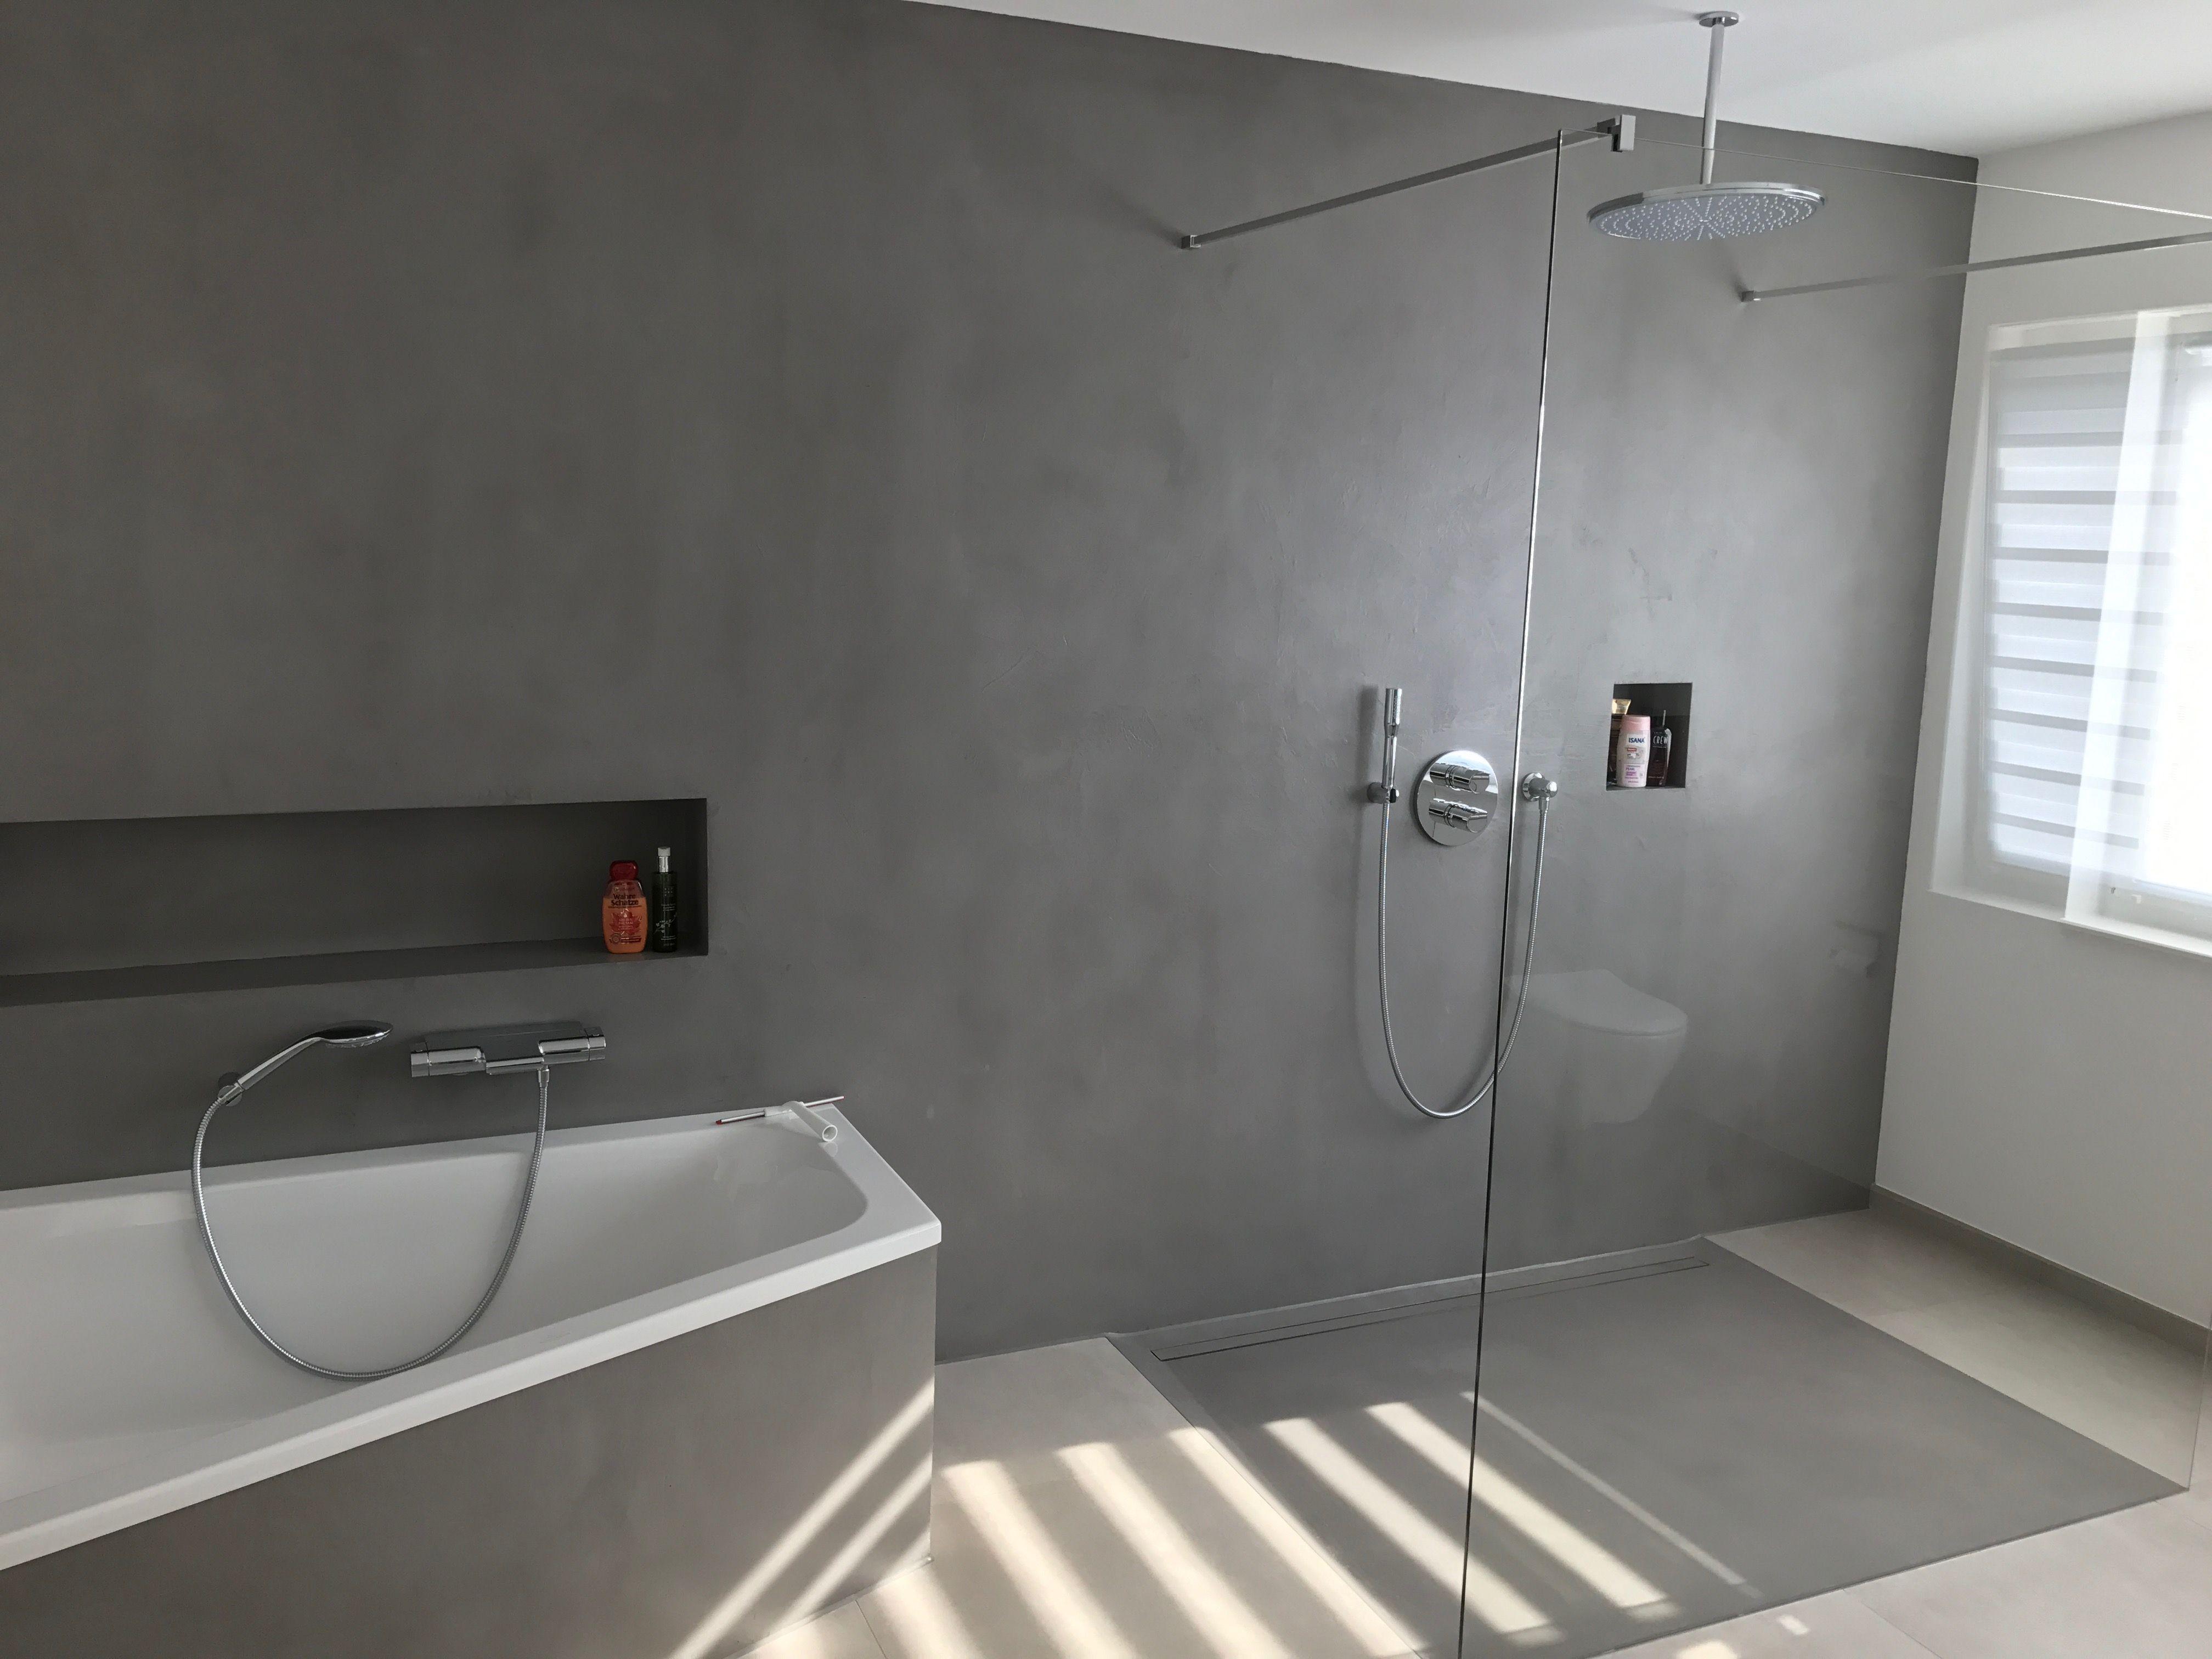 Fugenloses Bad Dusche Realisiert Mit Carament Beton Cire Homesweethome Fugenlos Homeandliving Betoncire Ba Fugenloses Bad Badezimmer Badezimmer Dekor